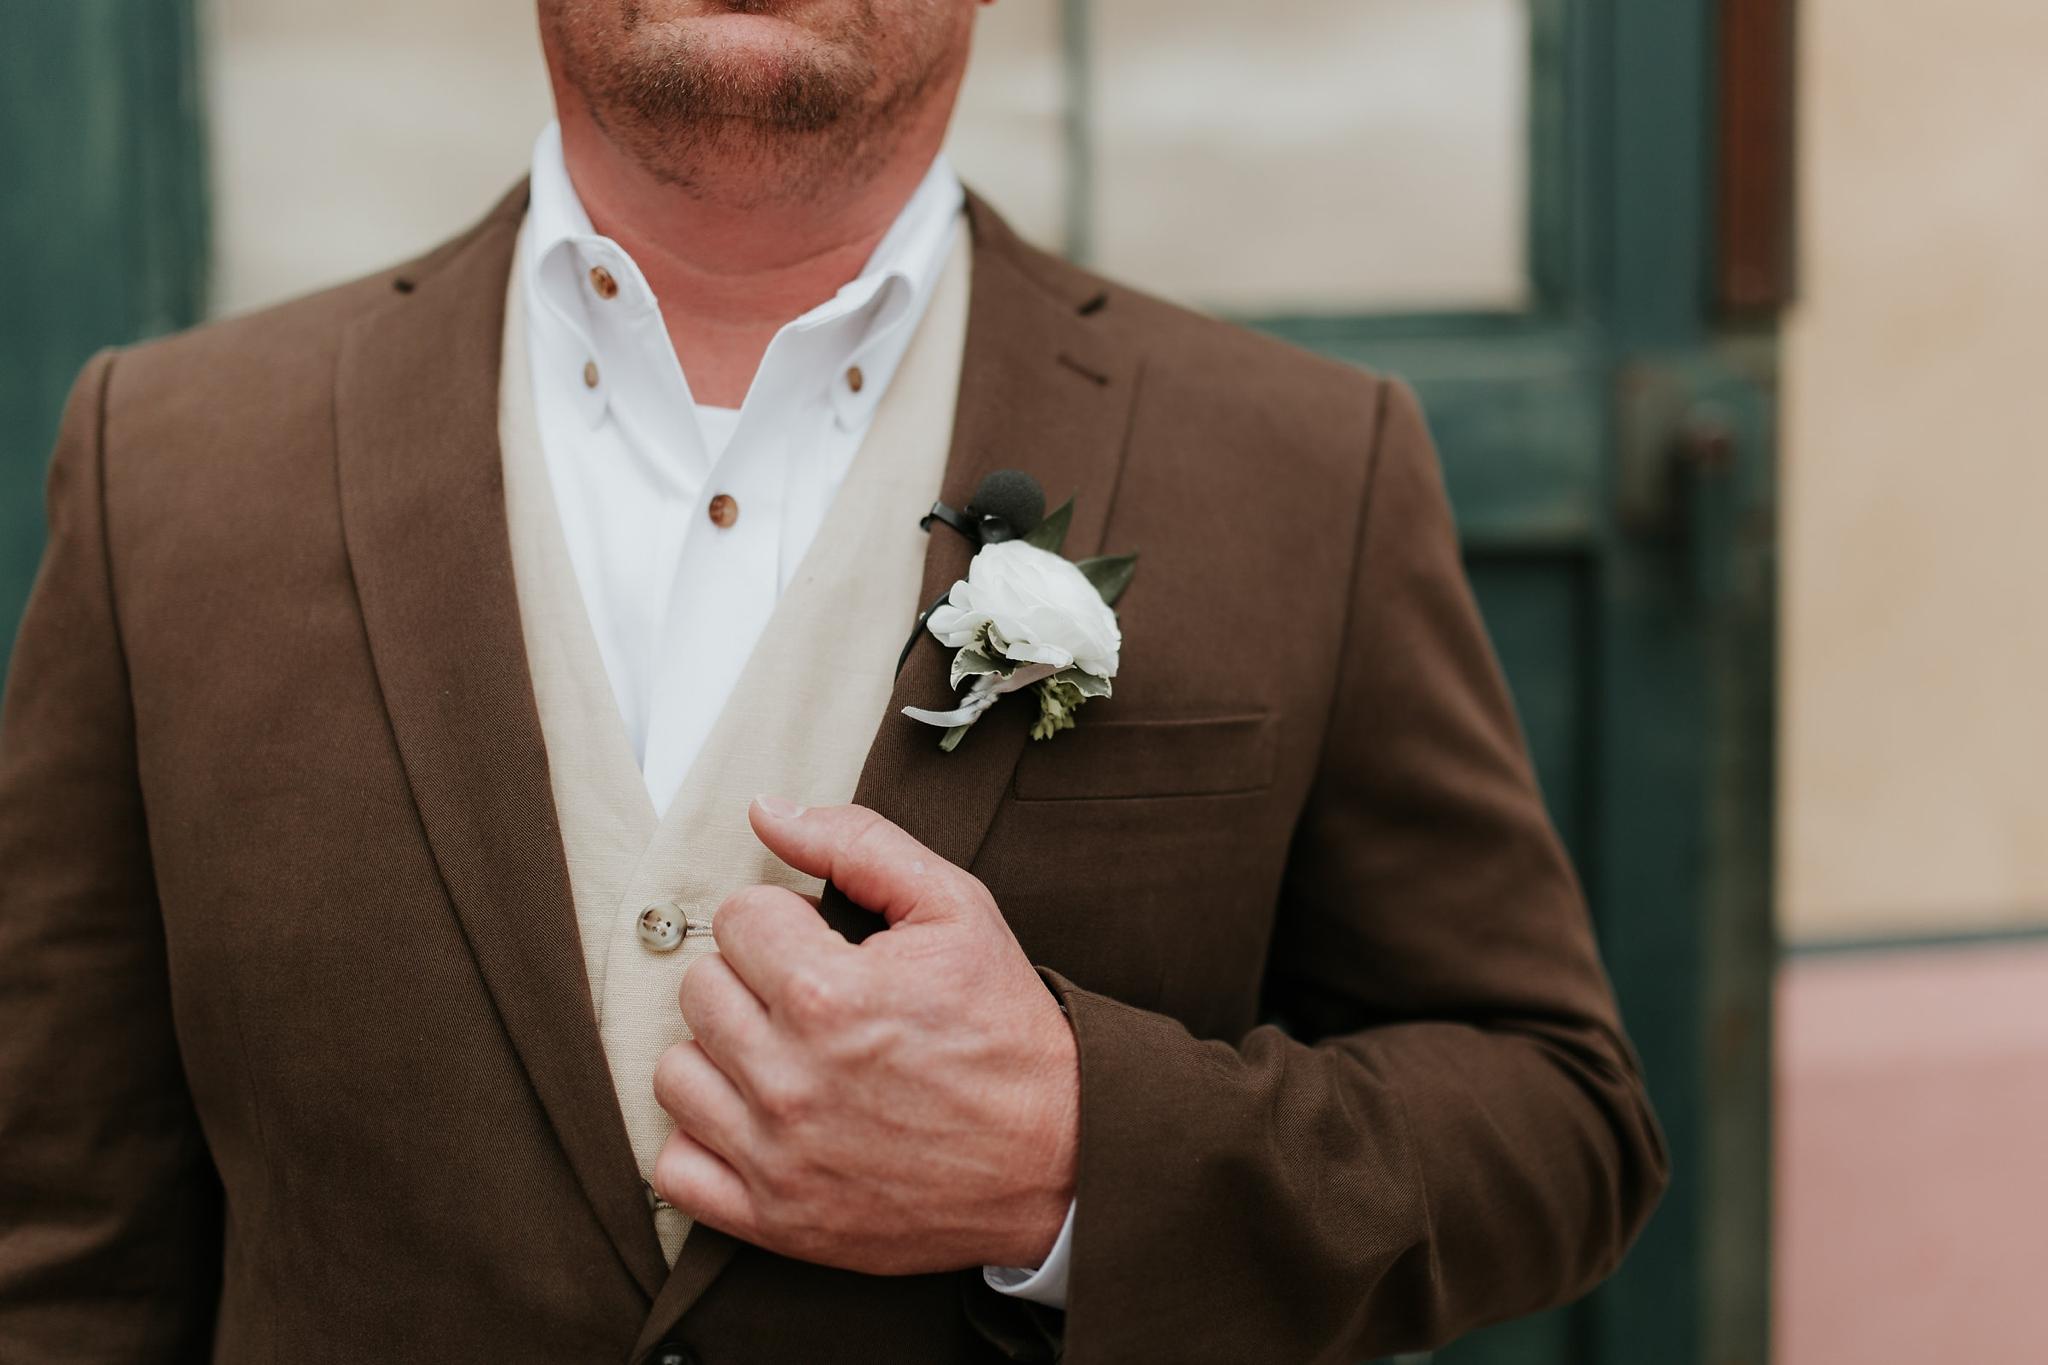 Alicia+lucia+photography+-+albuquerque+wedding+photographer+-+santa+fe+wedding+photography+-+new+mexico+wedding+photographer+-+new+mexico+wedding+-+wedding+-+groom+-+groom+style+-+wedding+style_0100.jpg